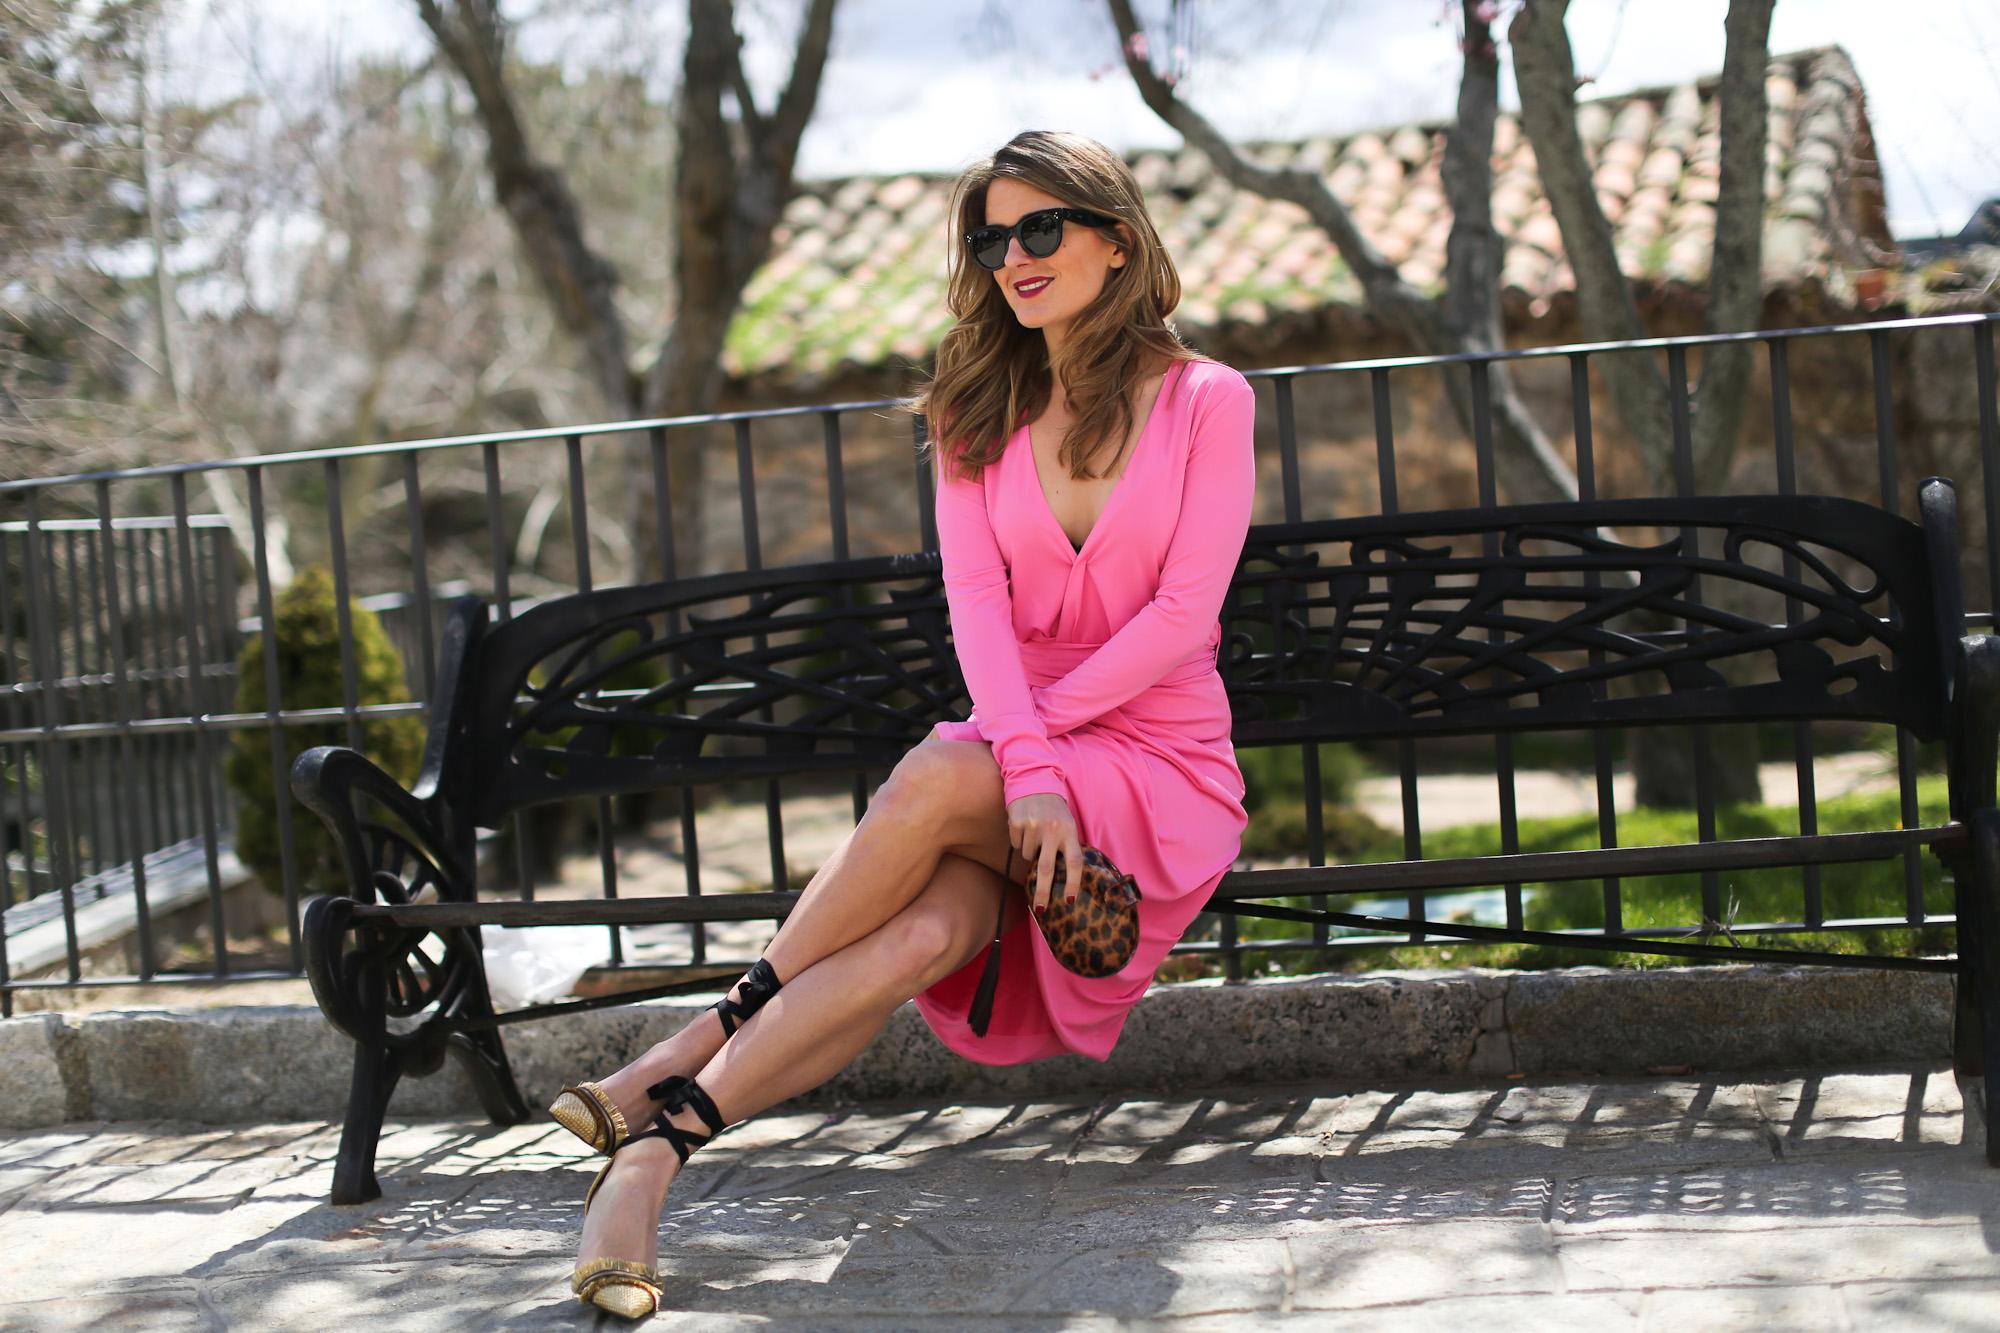 Clochet_streetstyle_BRUNA_brunacolection_vestido_moa_rosa